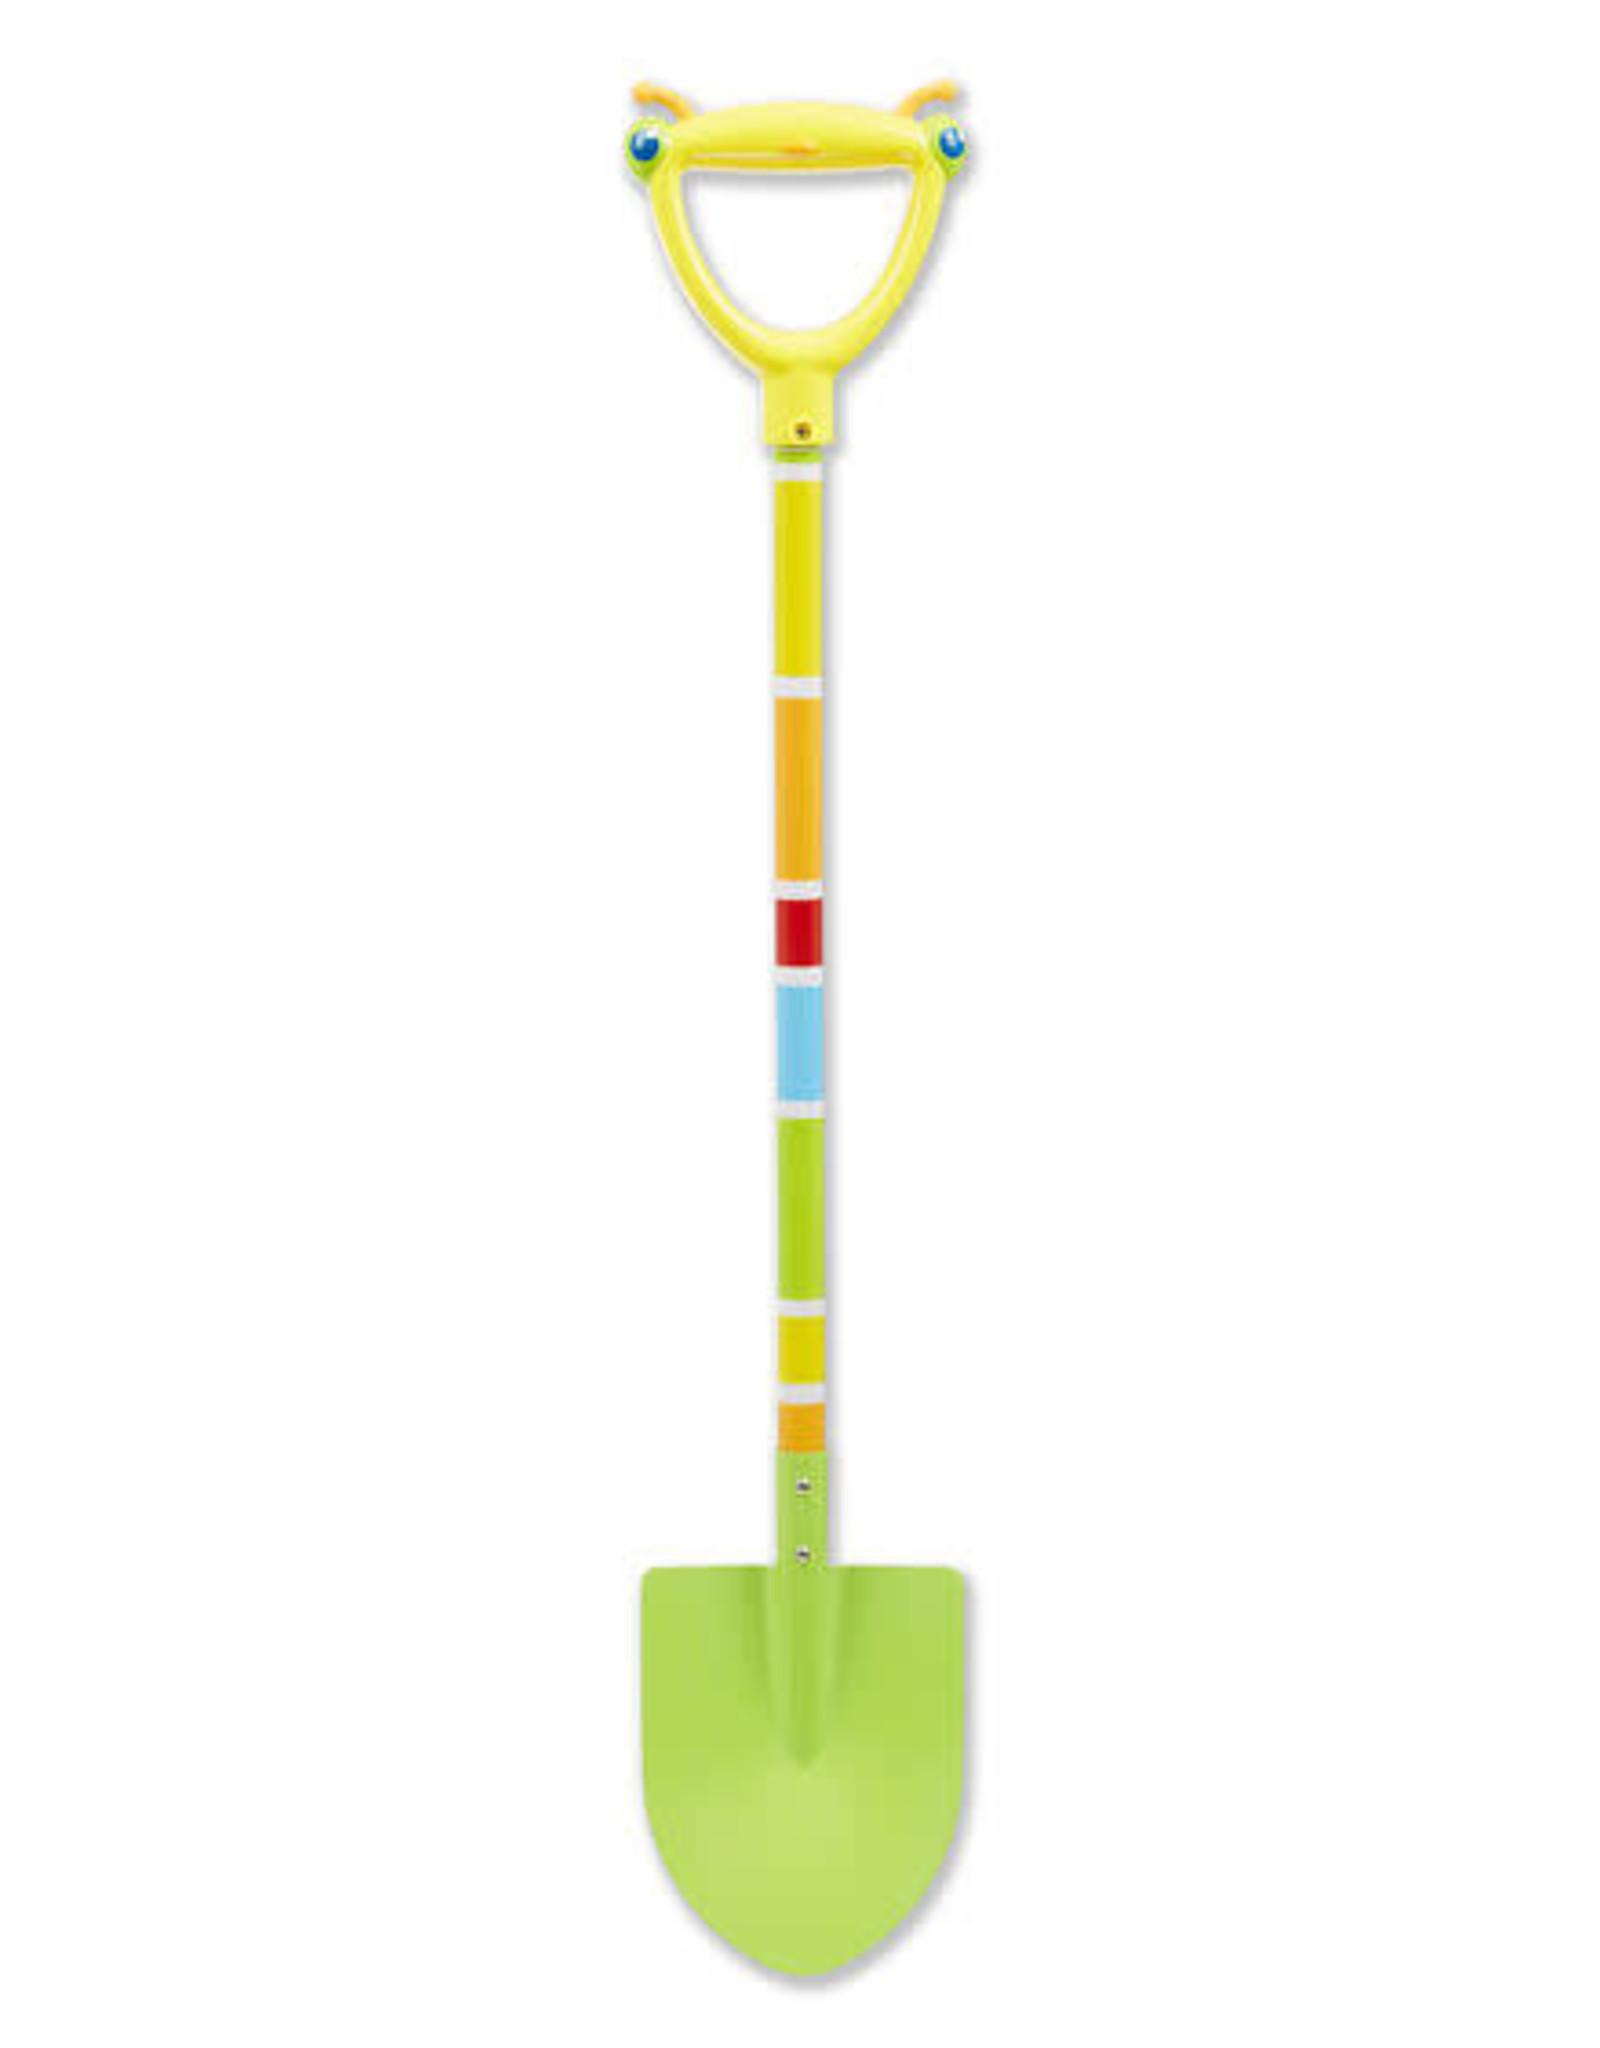 Melissa & Doug Giddy Buggy Shovel